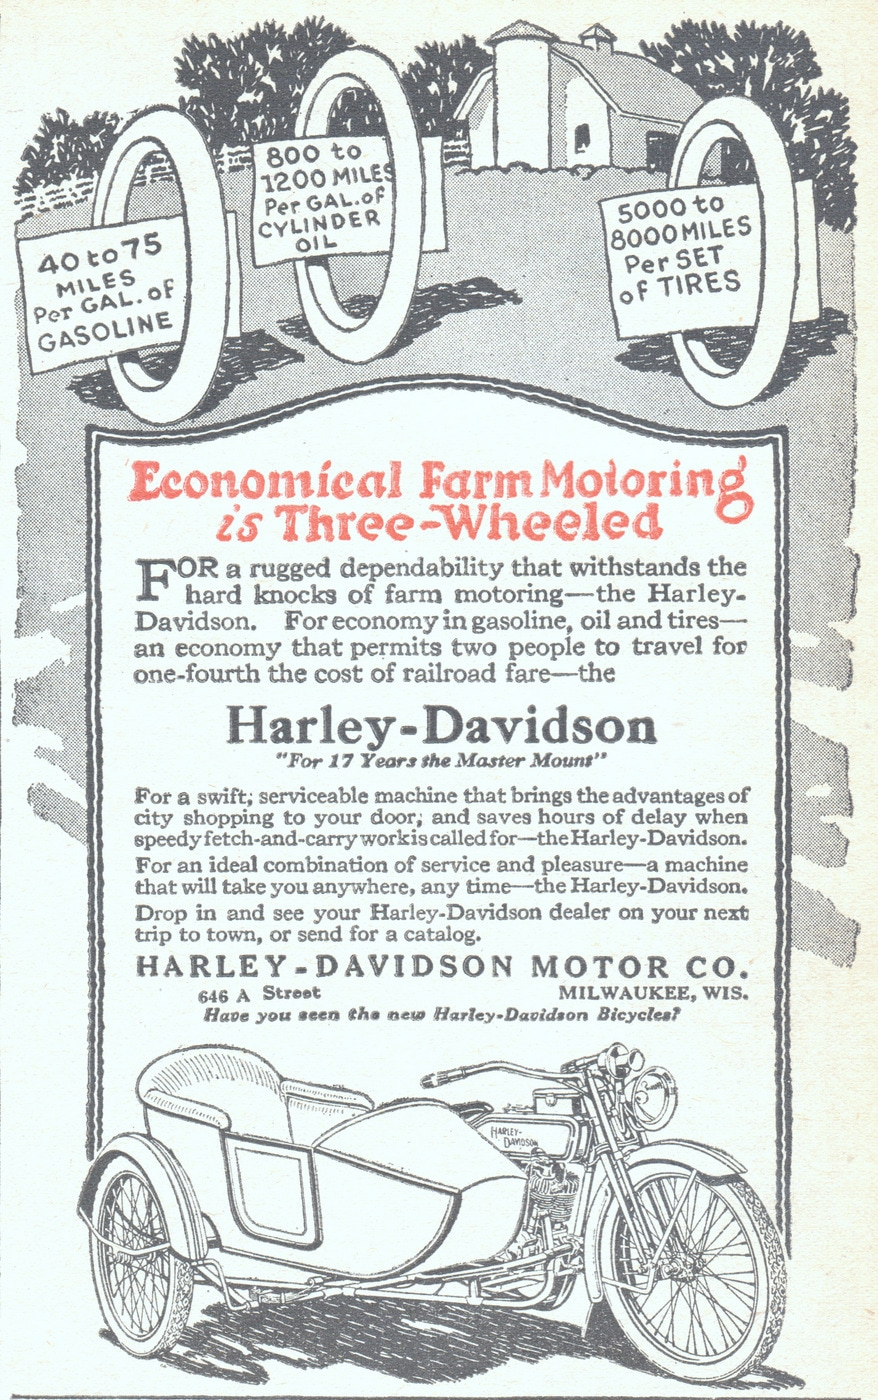 Harley-Davidson With Side Car